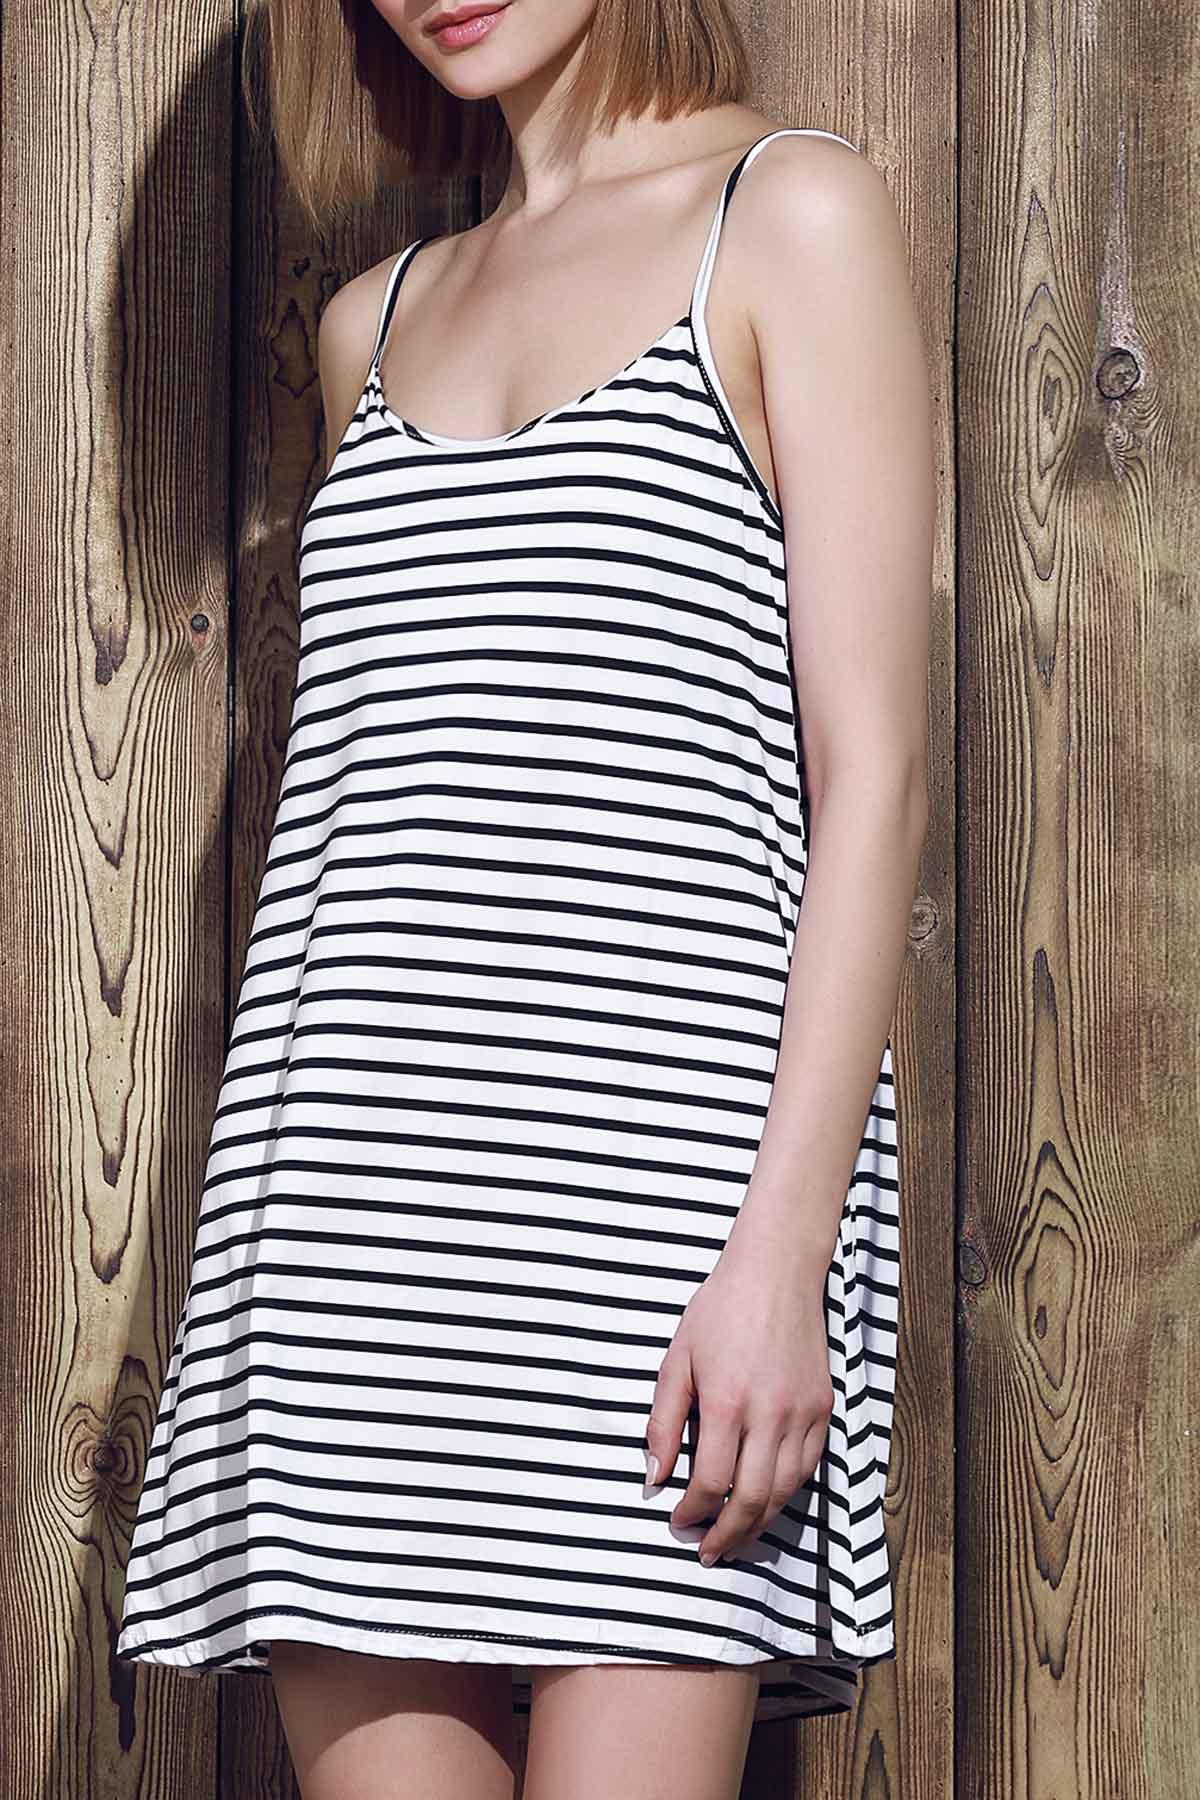 Spaghetti Strap A Line Stripe Dress - BLUE/WHITE S